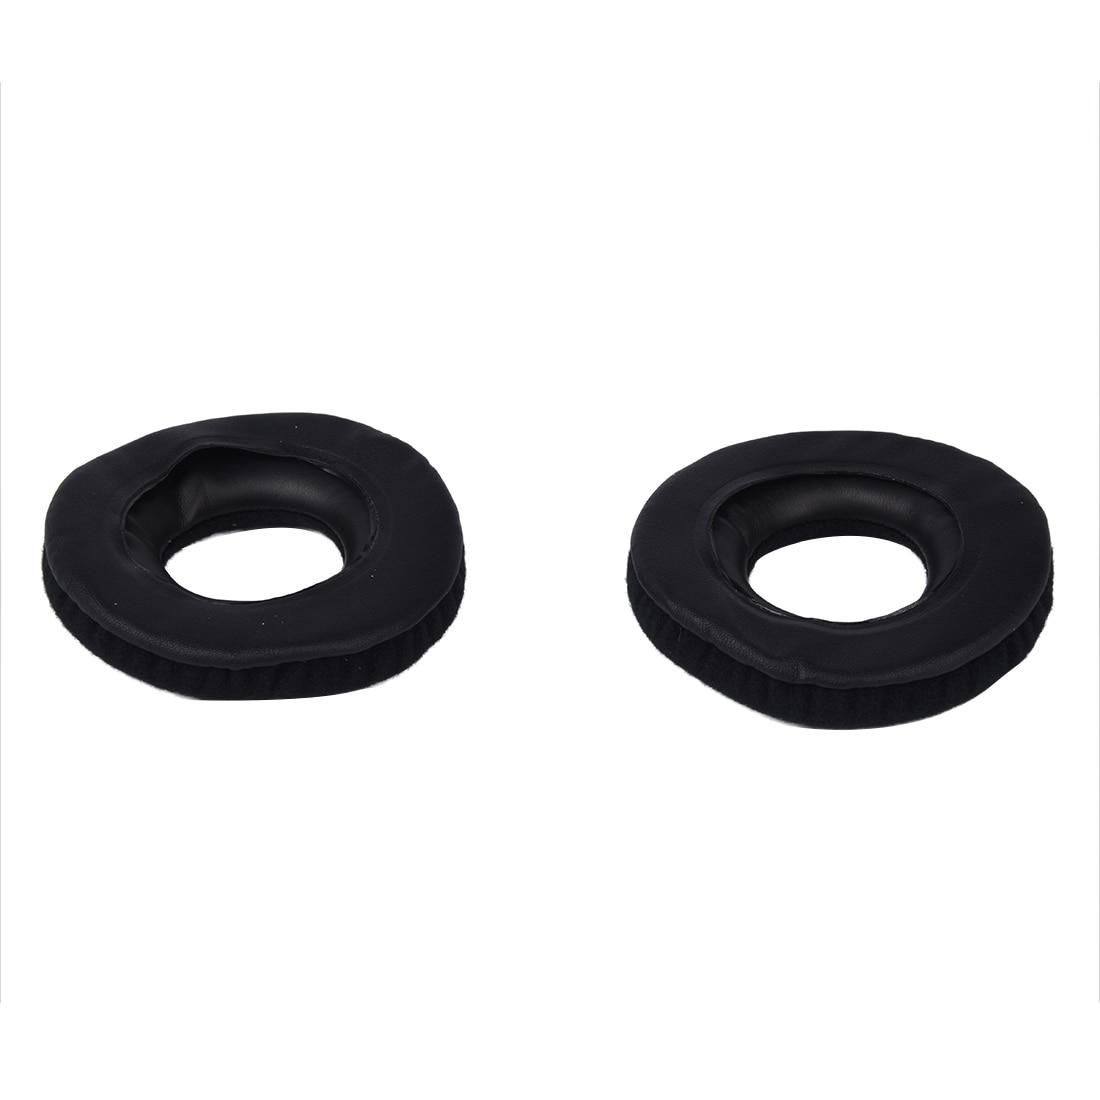 1 Pair of Black Headphones Headset replacements for Beyerdynamic DT770 DT551 DT880 DT990 DT531 DT801 DT440 DT660